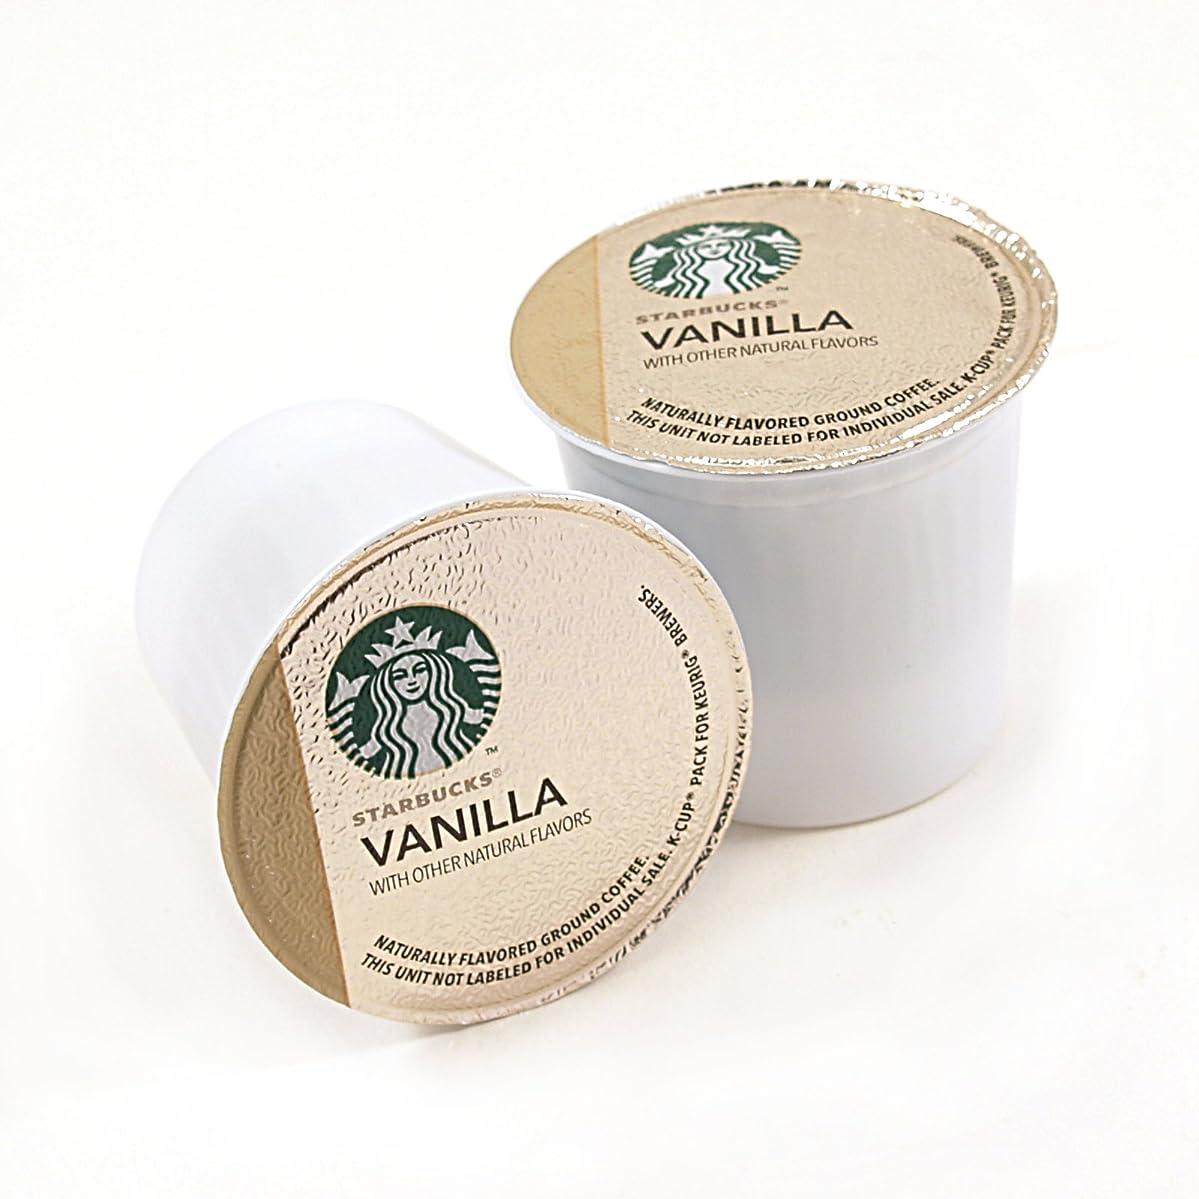 Starbucks Vanilla Coffee Keurig K-Cups, 128 Count vgywpmhqbzt0